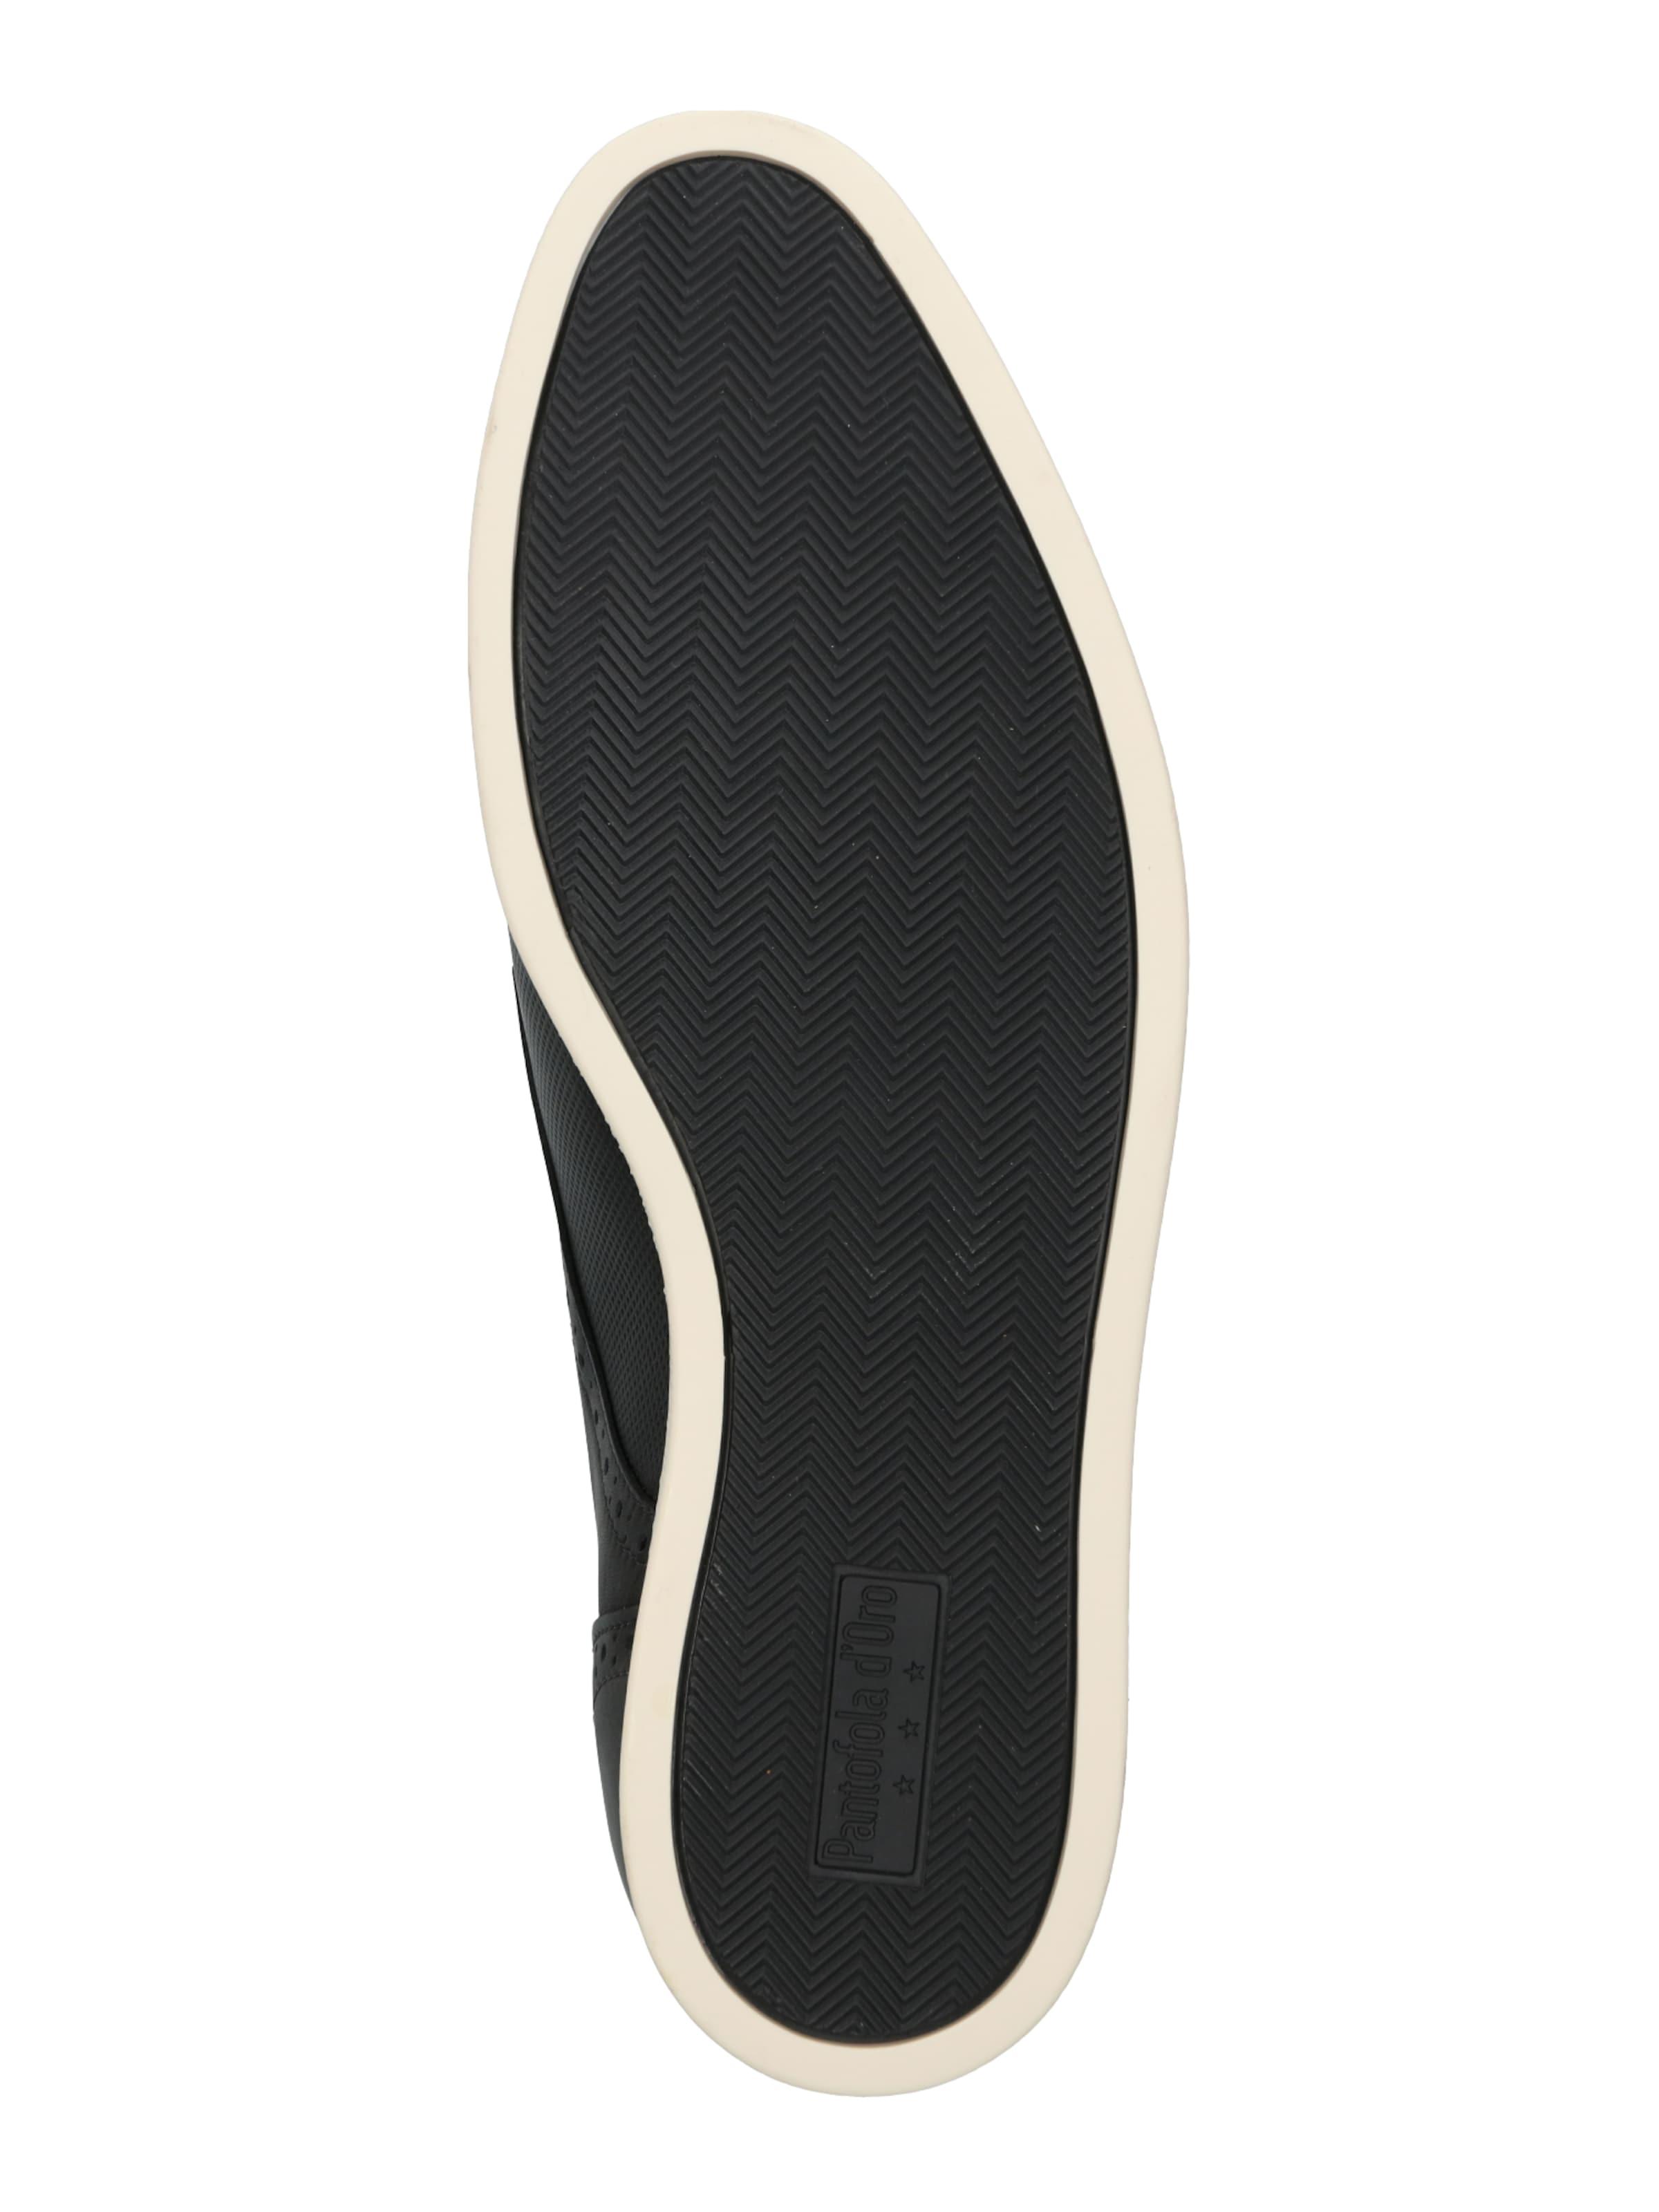 'lugo Schwarz D'oro Halbschuhe Uomo Pantofola In Low' QxBoCWder